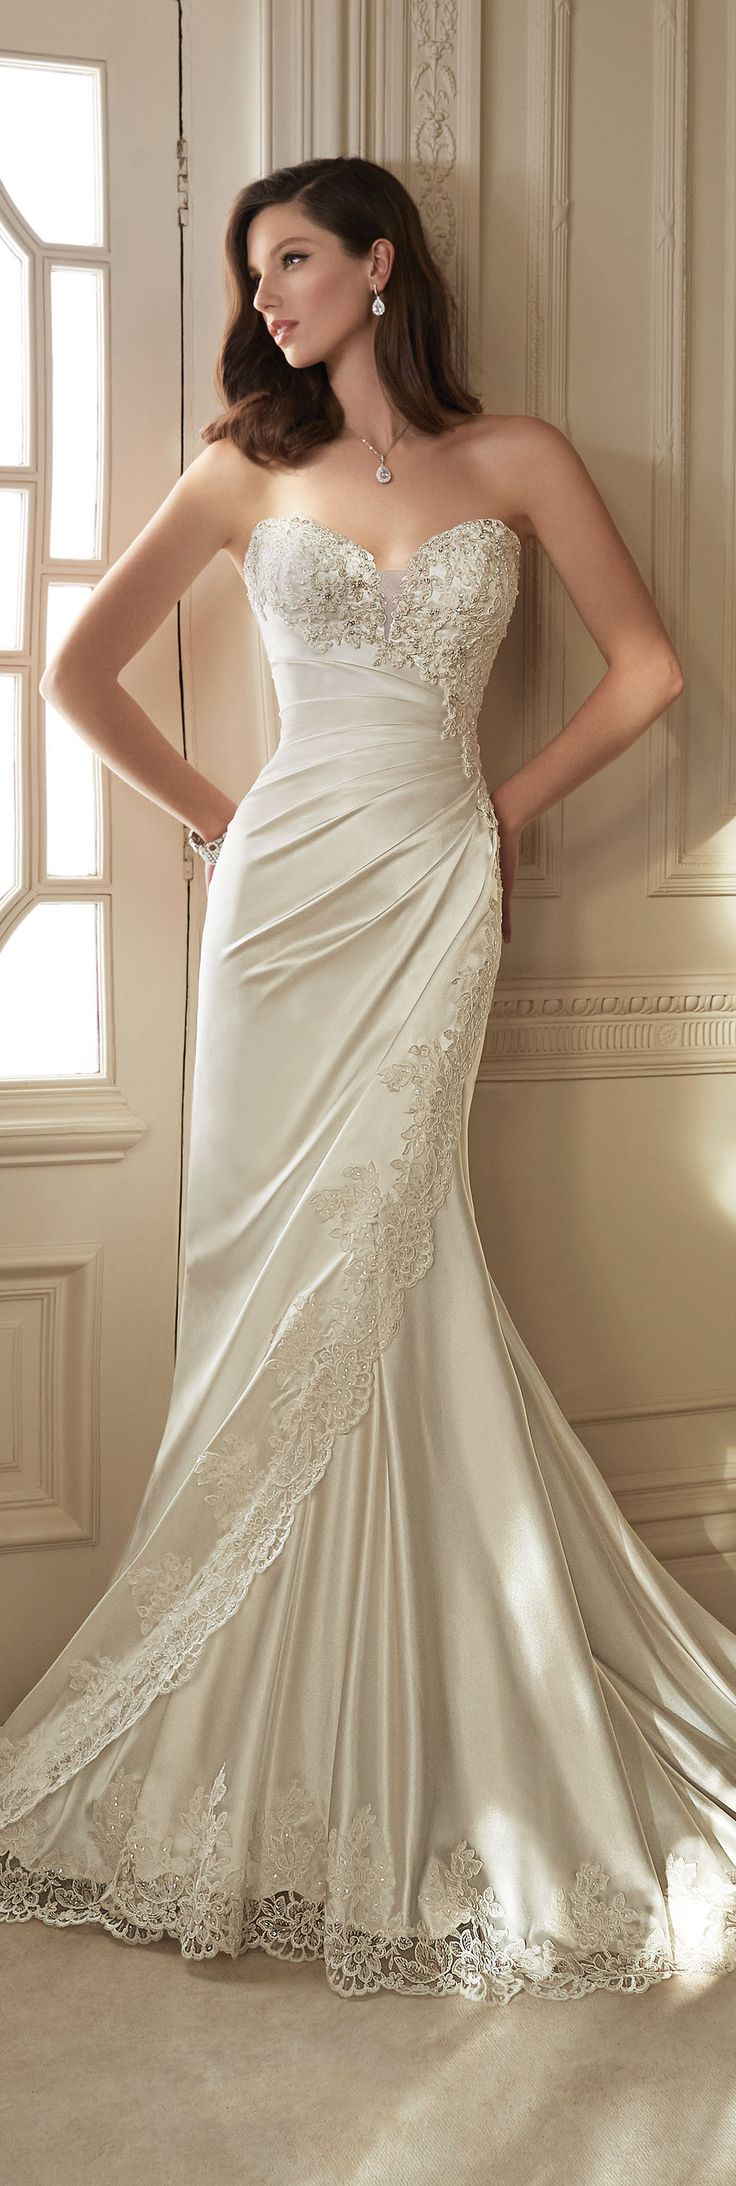 Bargain Wedding Dresses